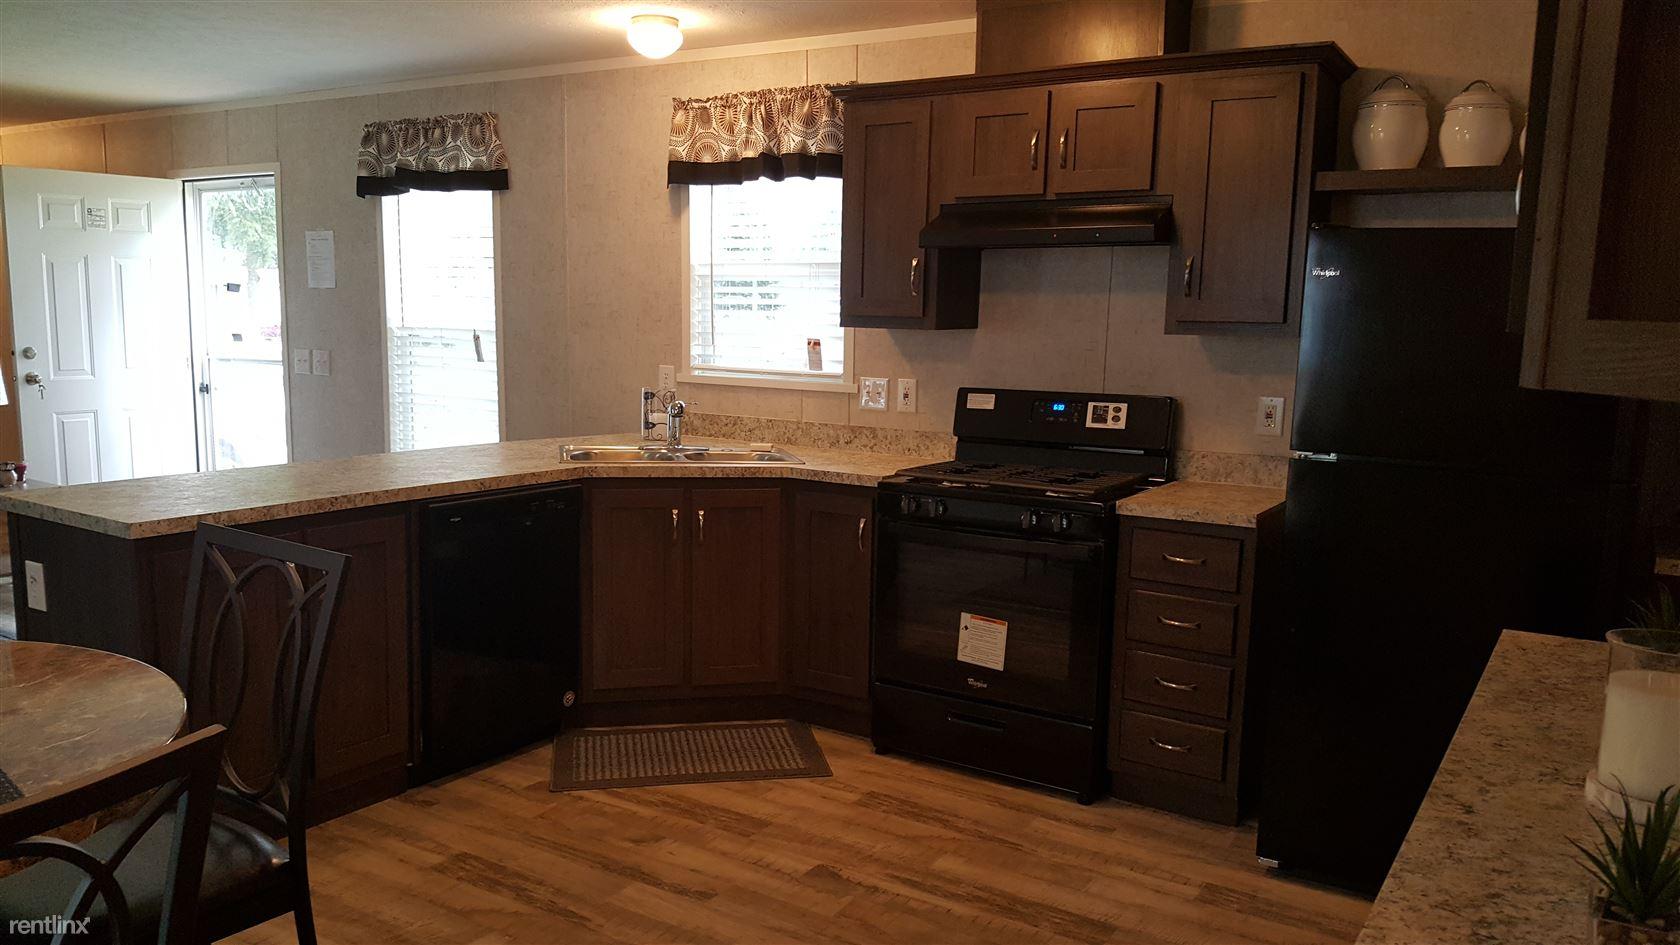 Tylersville Rd & King Ave, Fairfield Township, OH - $745